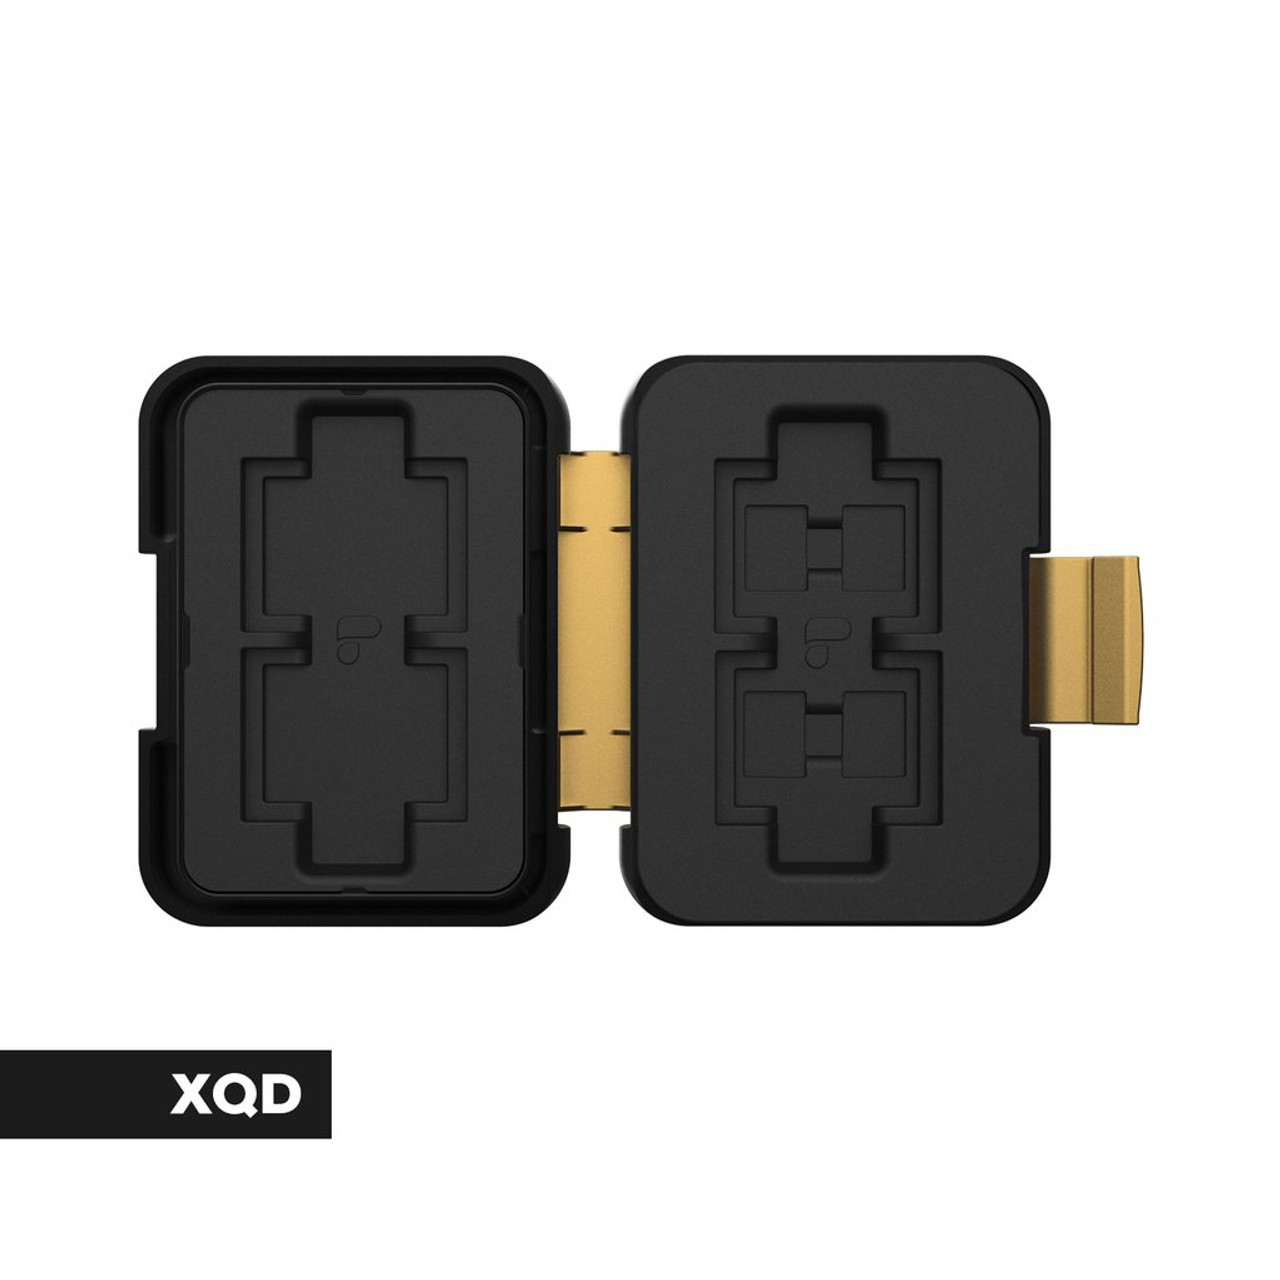 POLARPRO XQD SLATE MEMORY CARD CASE